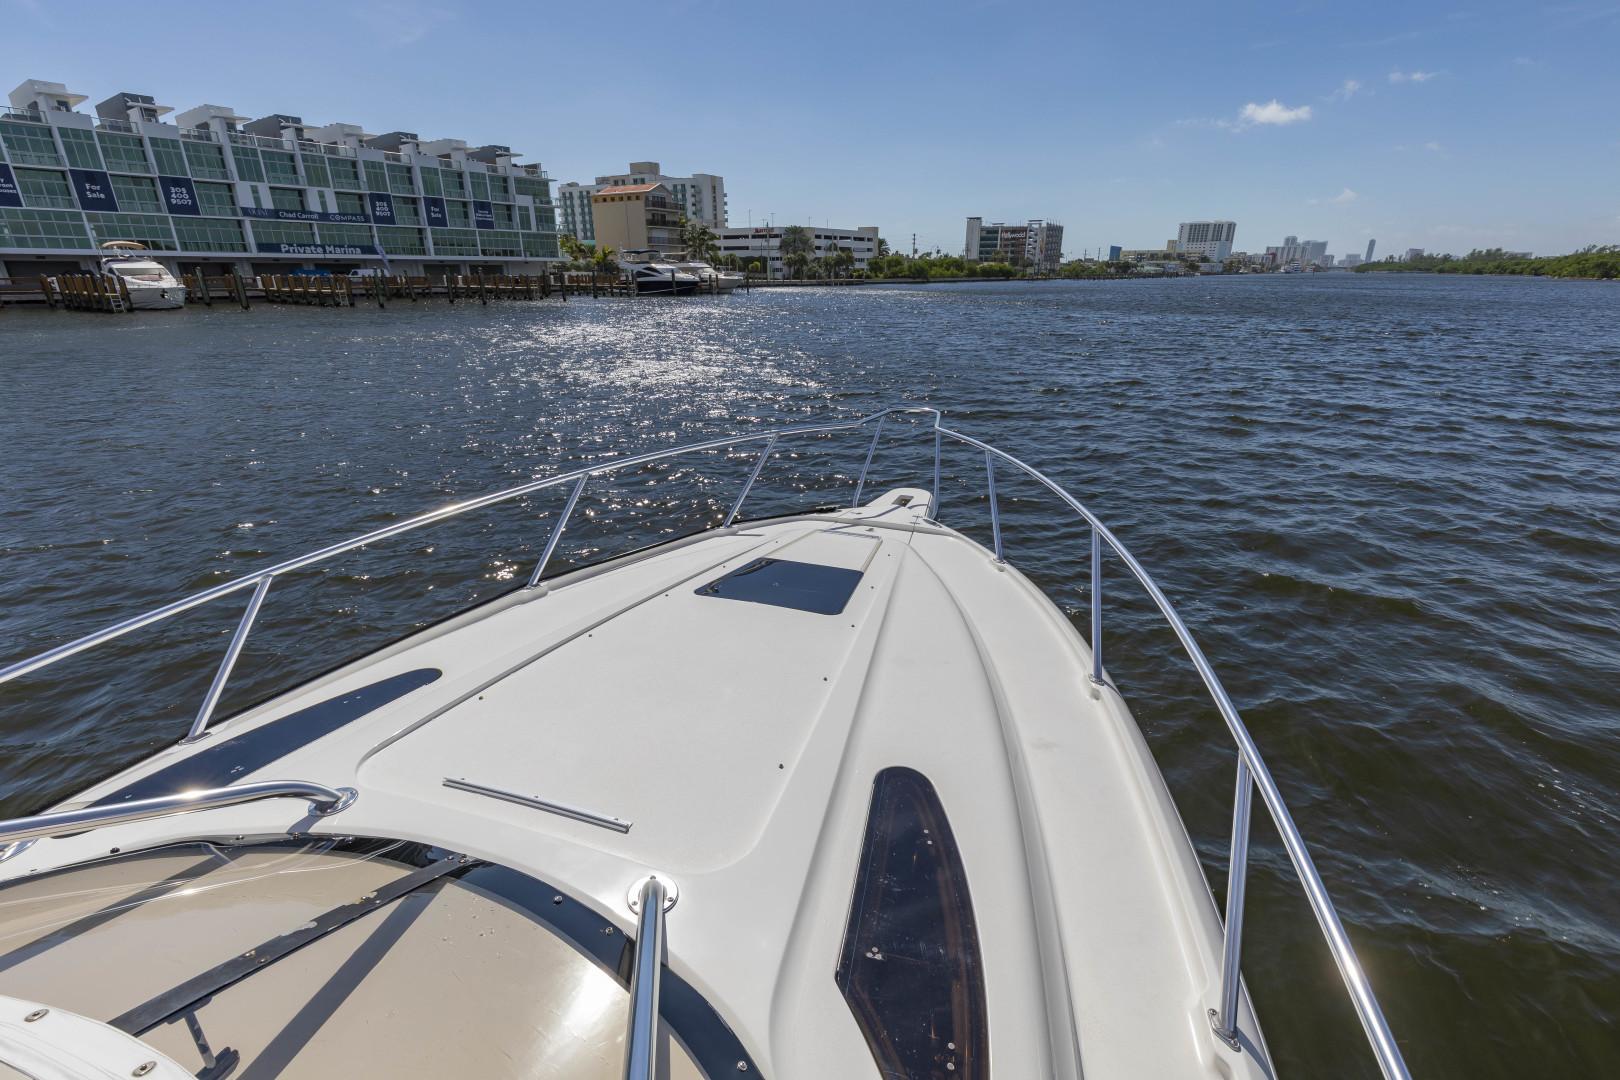 Intrepid-377 Walkaround 2005-Rock Boat REFIT 2018 Dania Beach-Florida-United States-377 Intrepid Bow 1-1511536 | Thumbnail